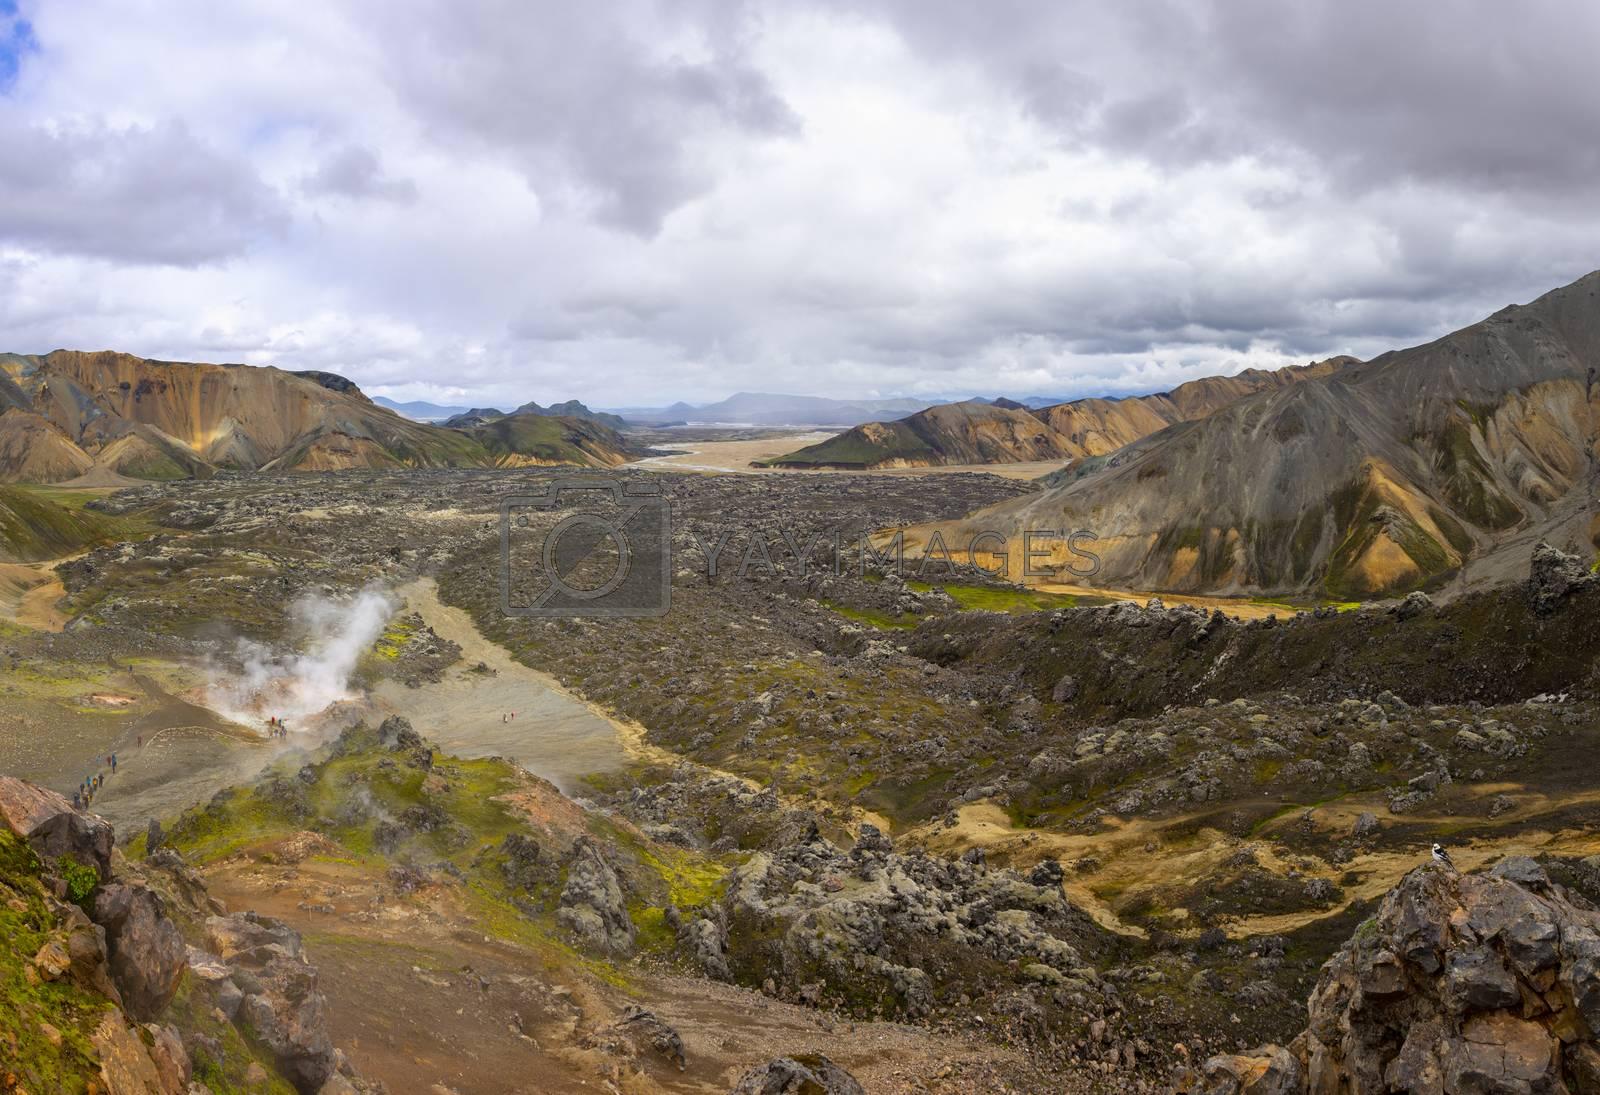 Hiking the Laugavegur hiking trail in landmannalaugar, fjallabak, Iceland. Travel, tourism, nature landscape and adventure